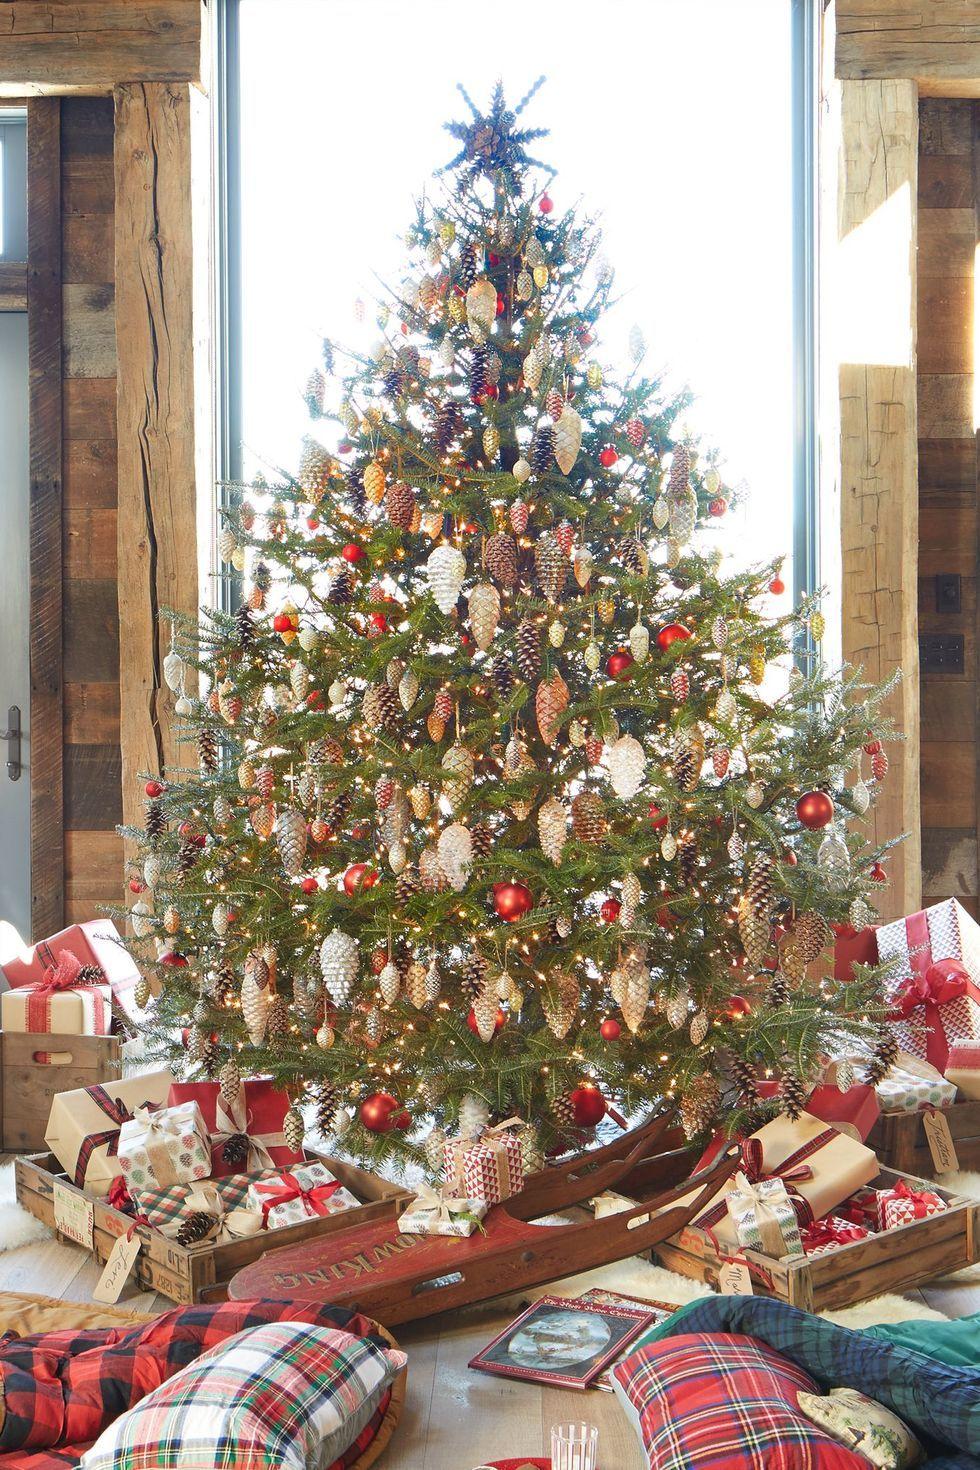 Cozy Rustic Outdoor Christmas Decor Ideas